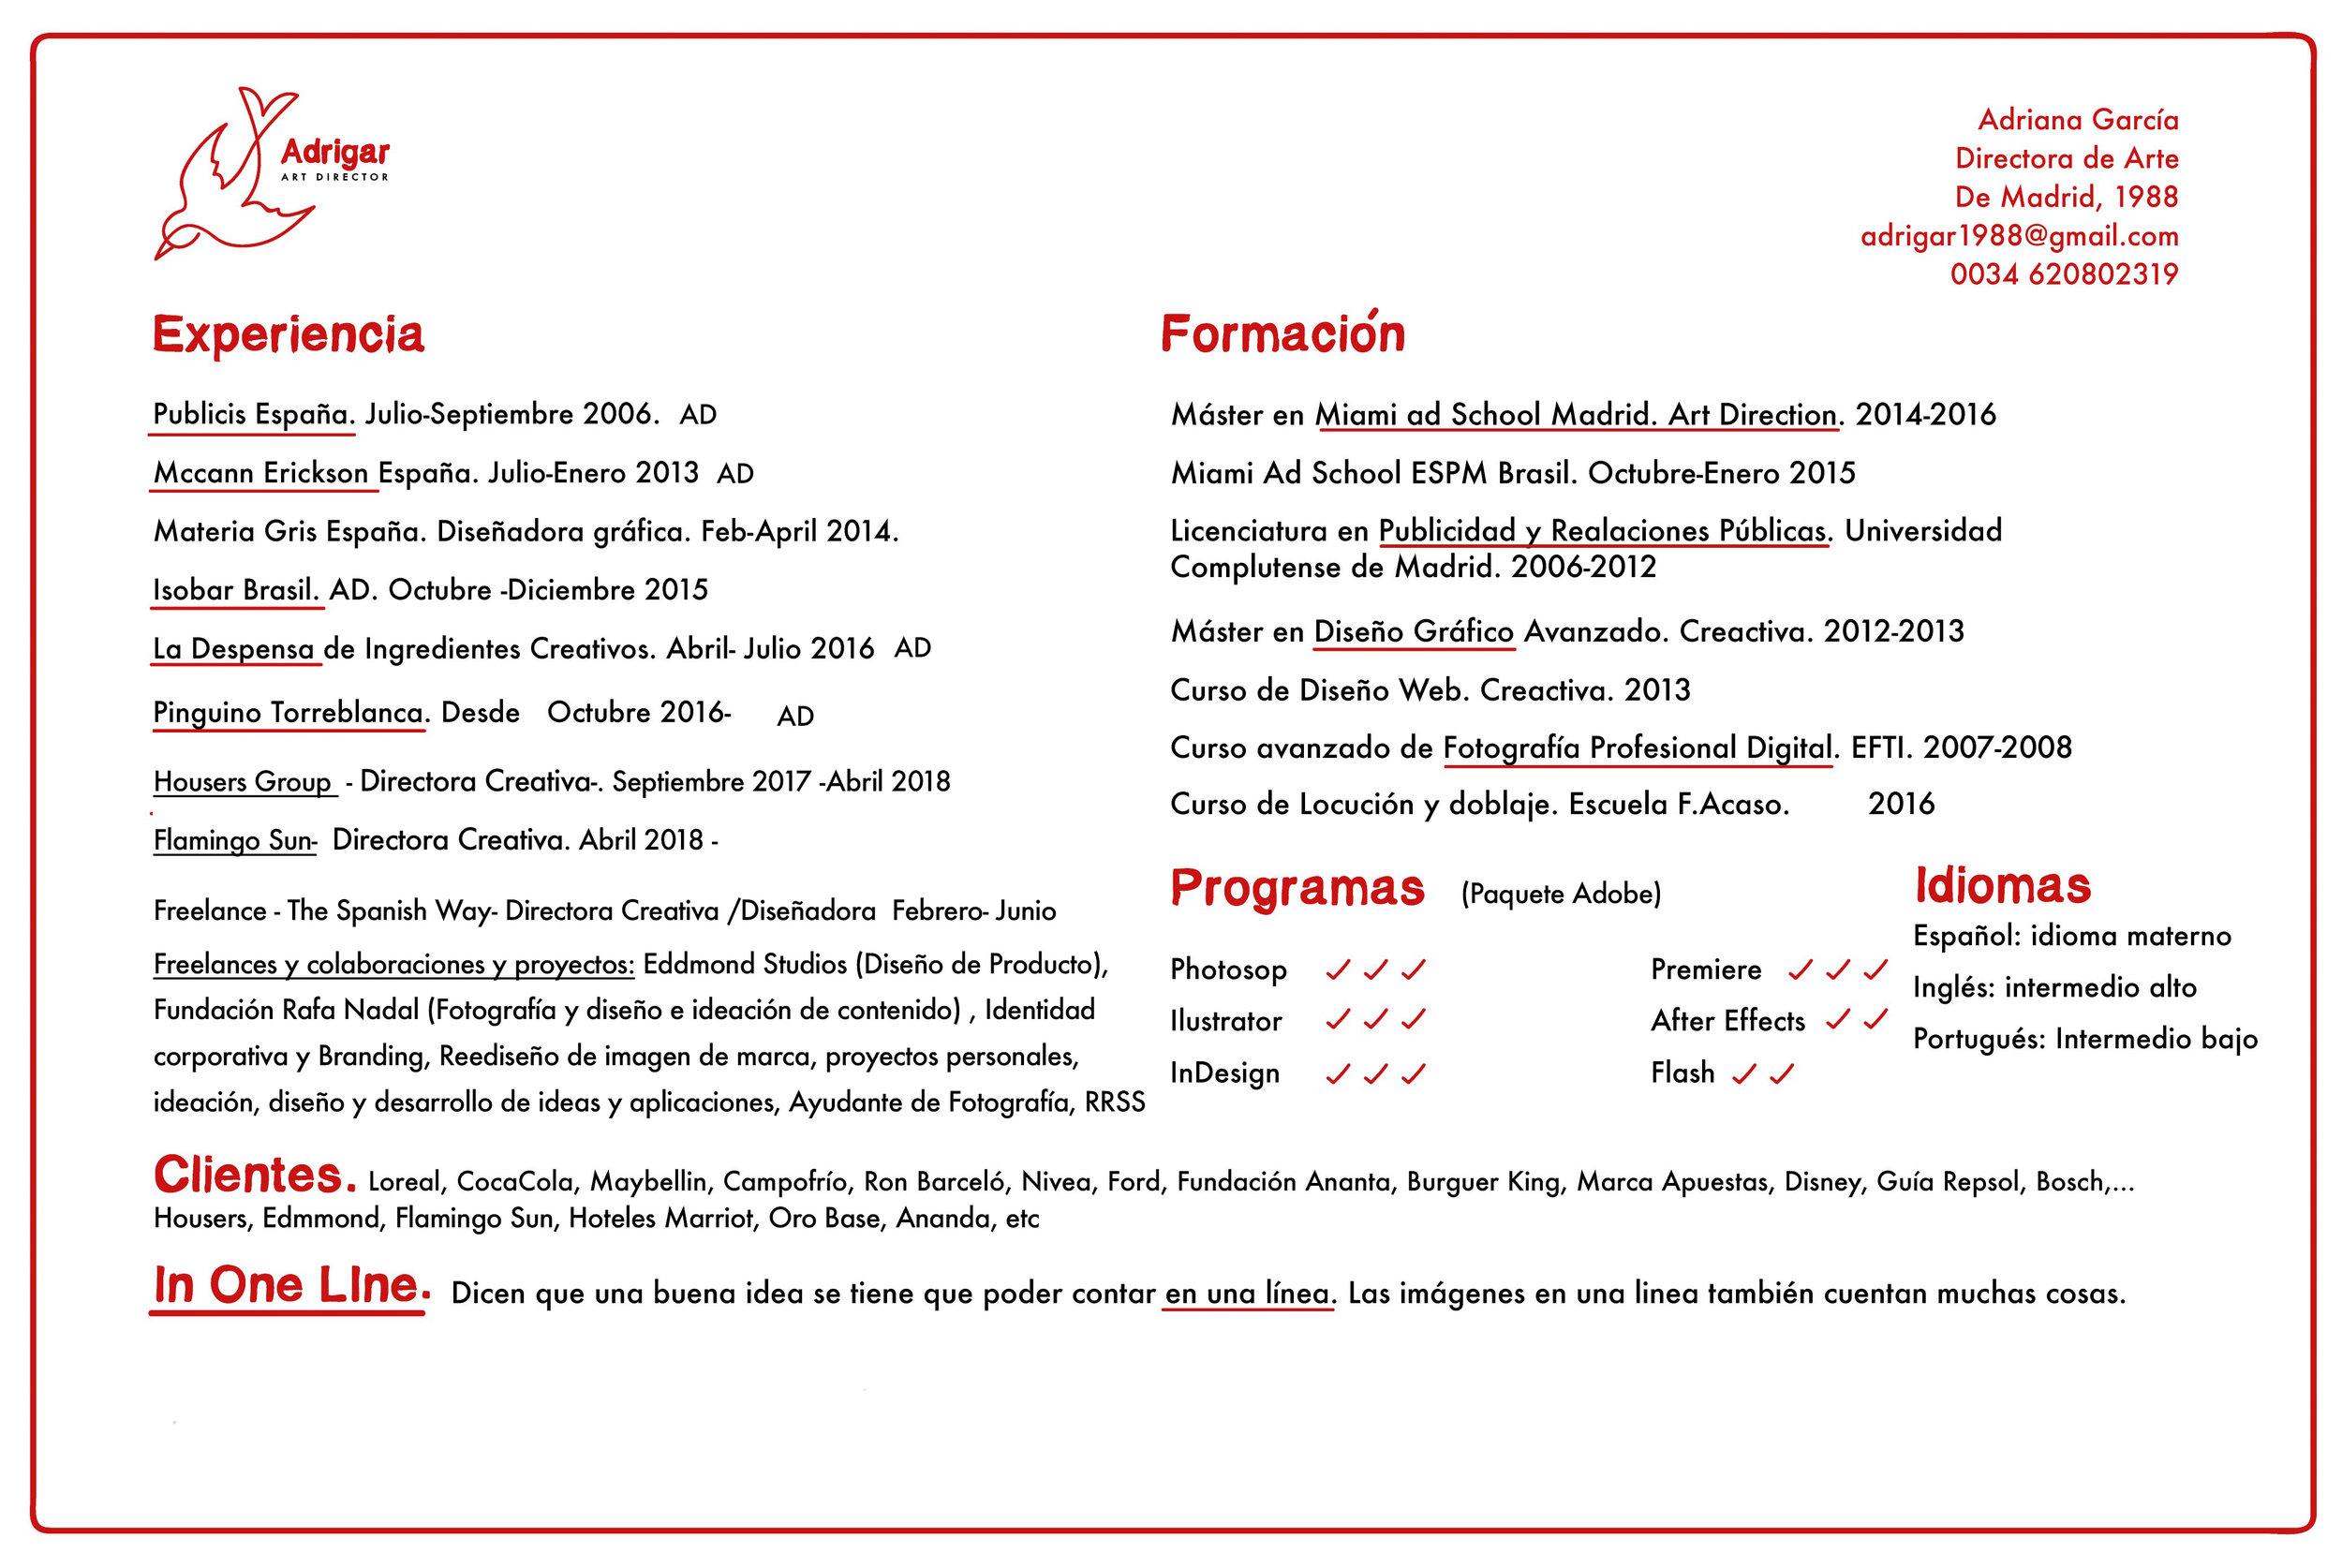 Adrigar CV- Resume copia.jpg